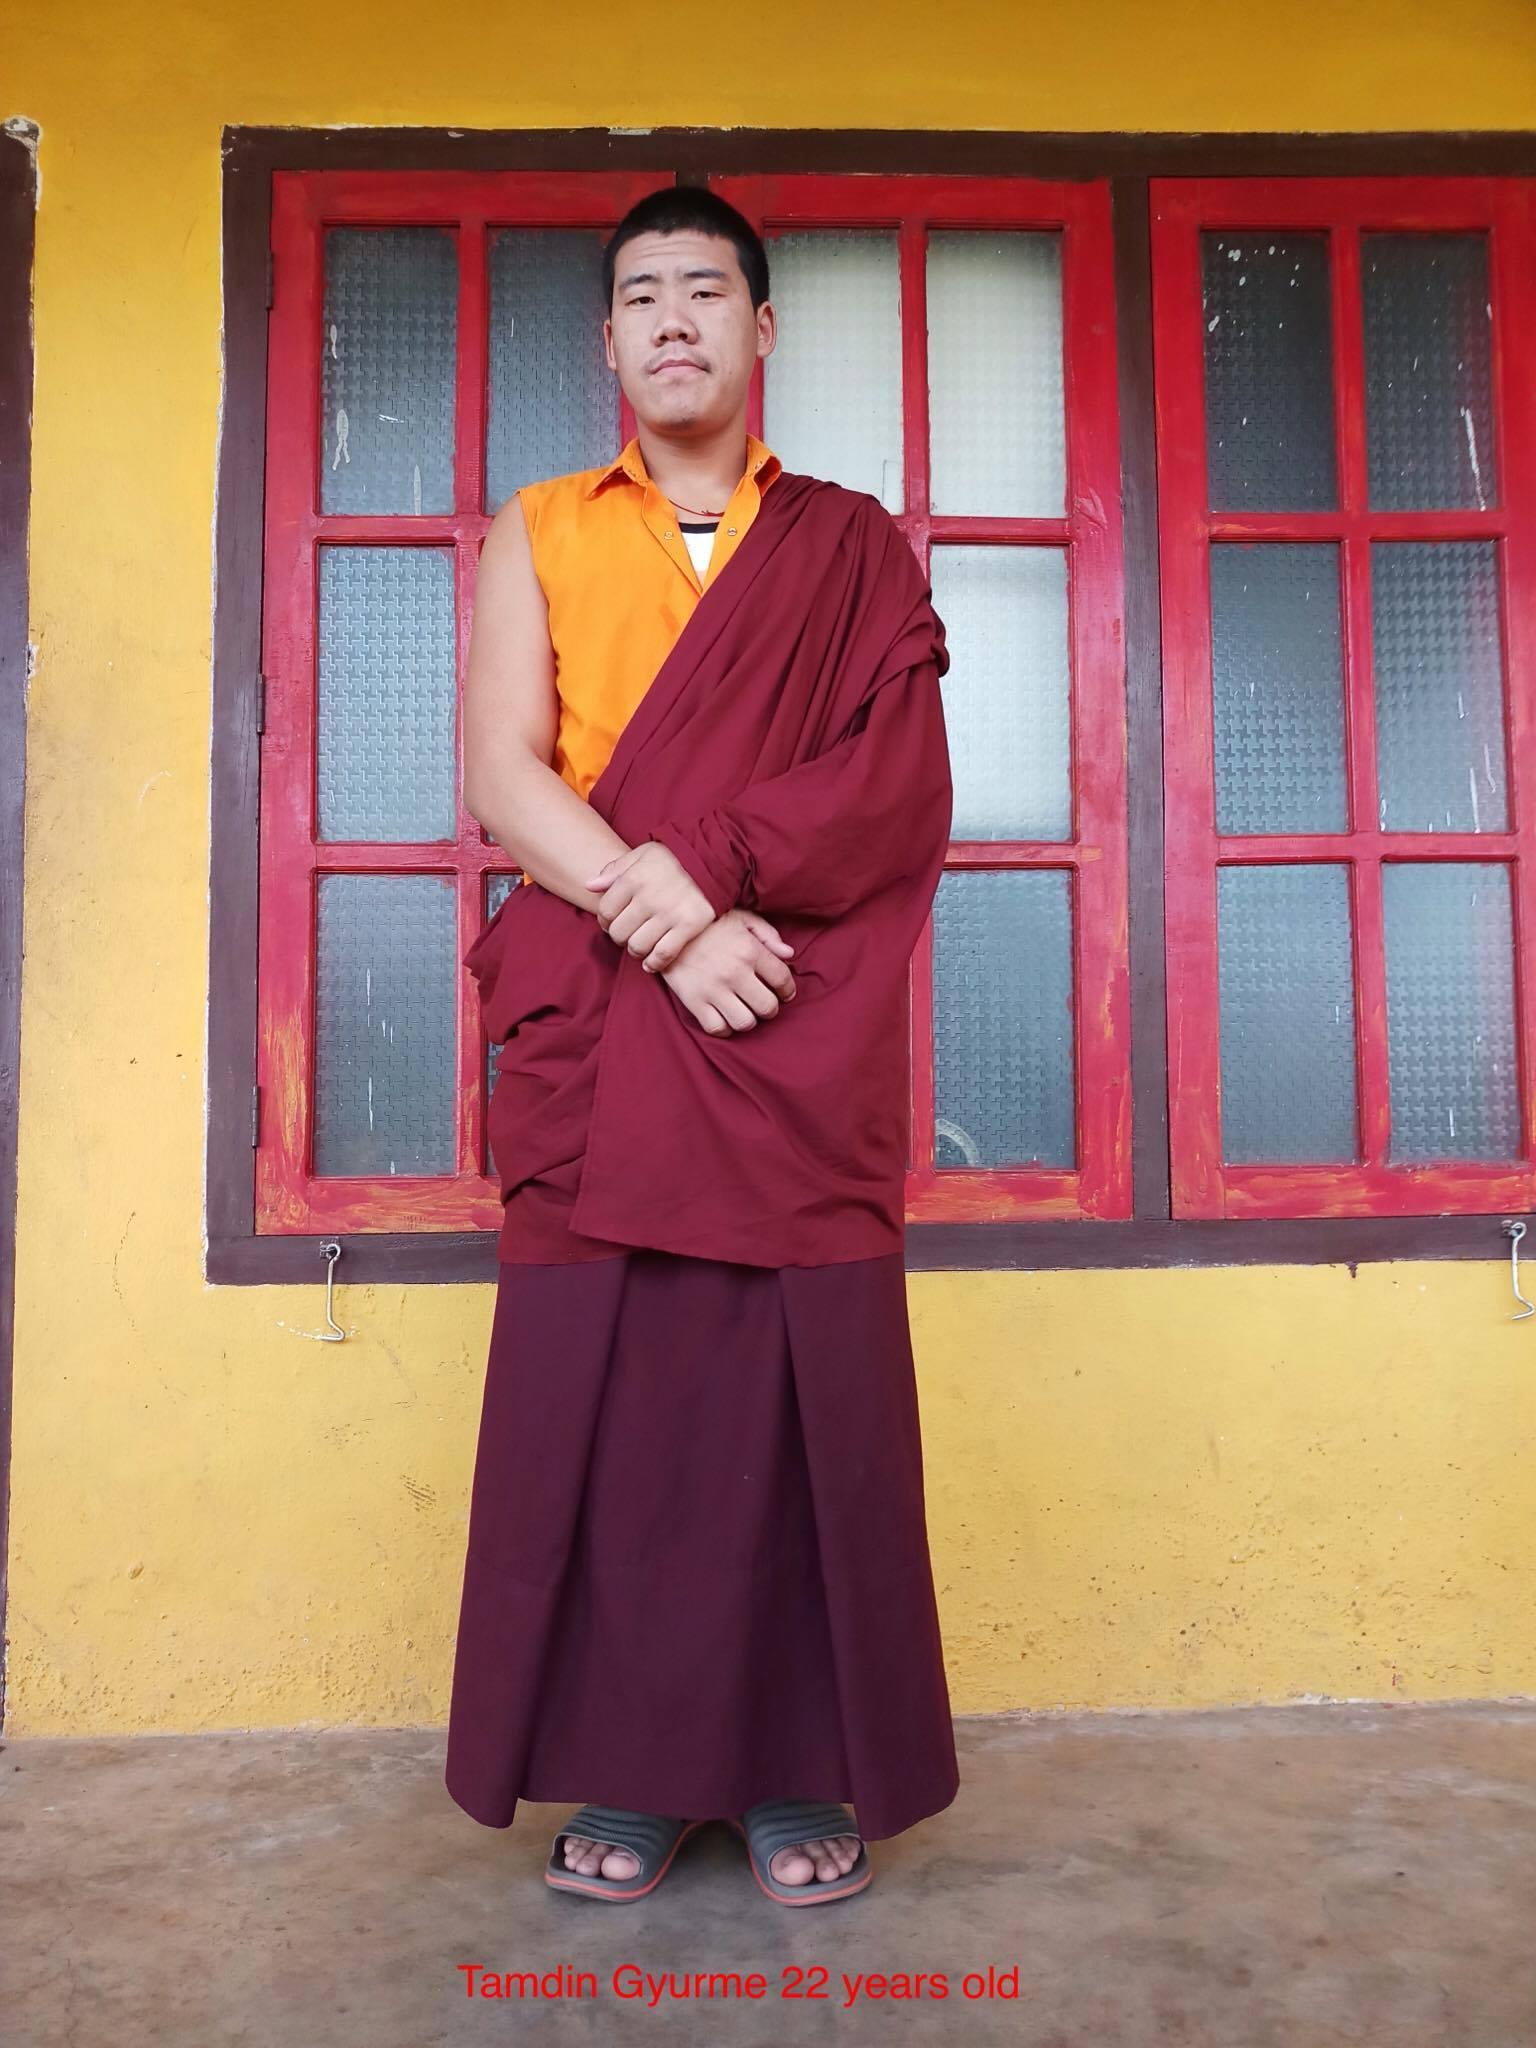 Monk_Tamdin_Gyrume_22yrs_old.jpg